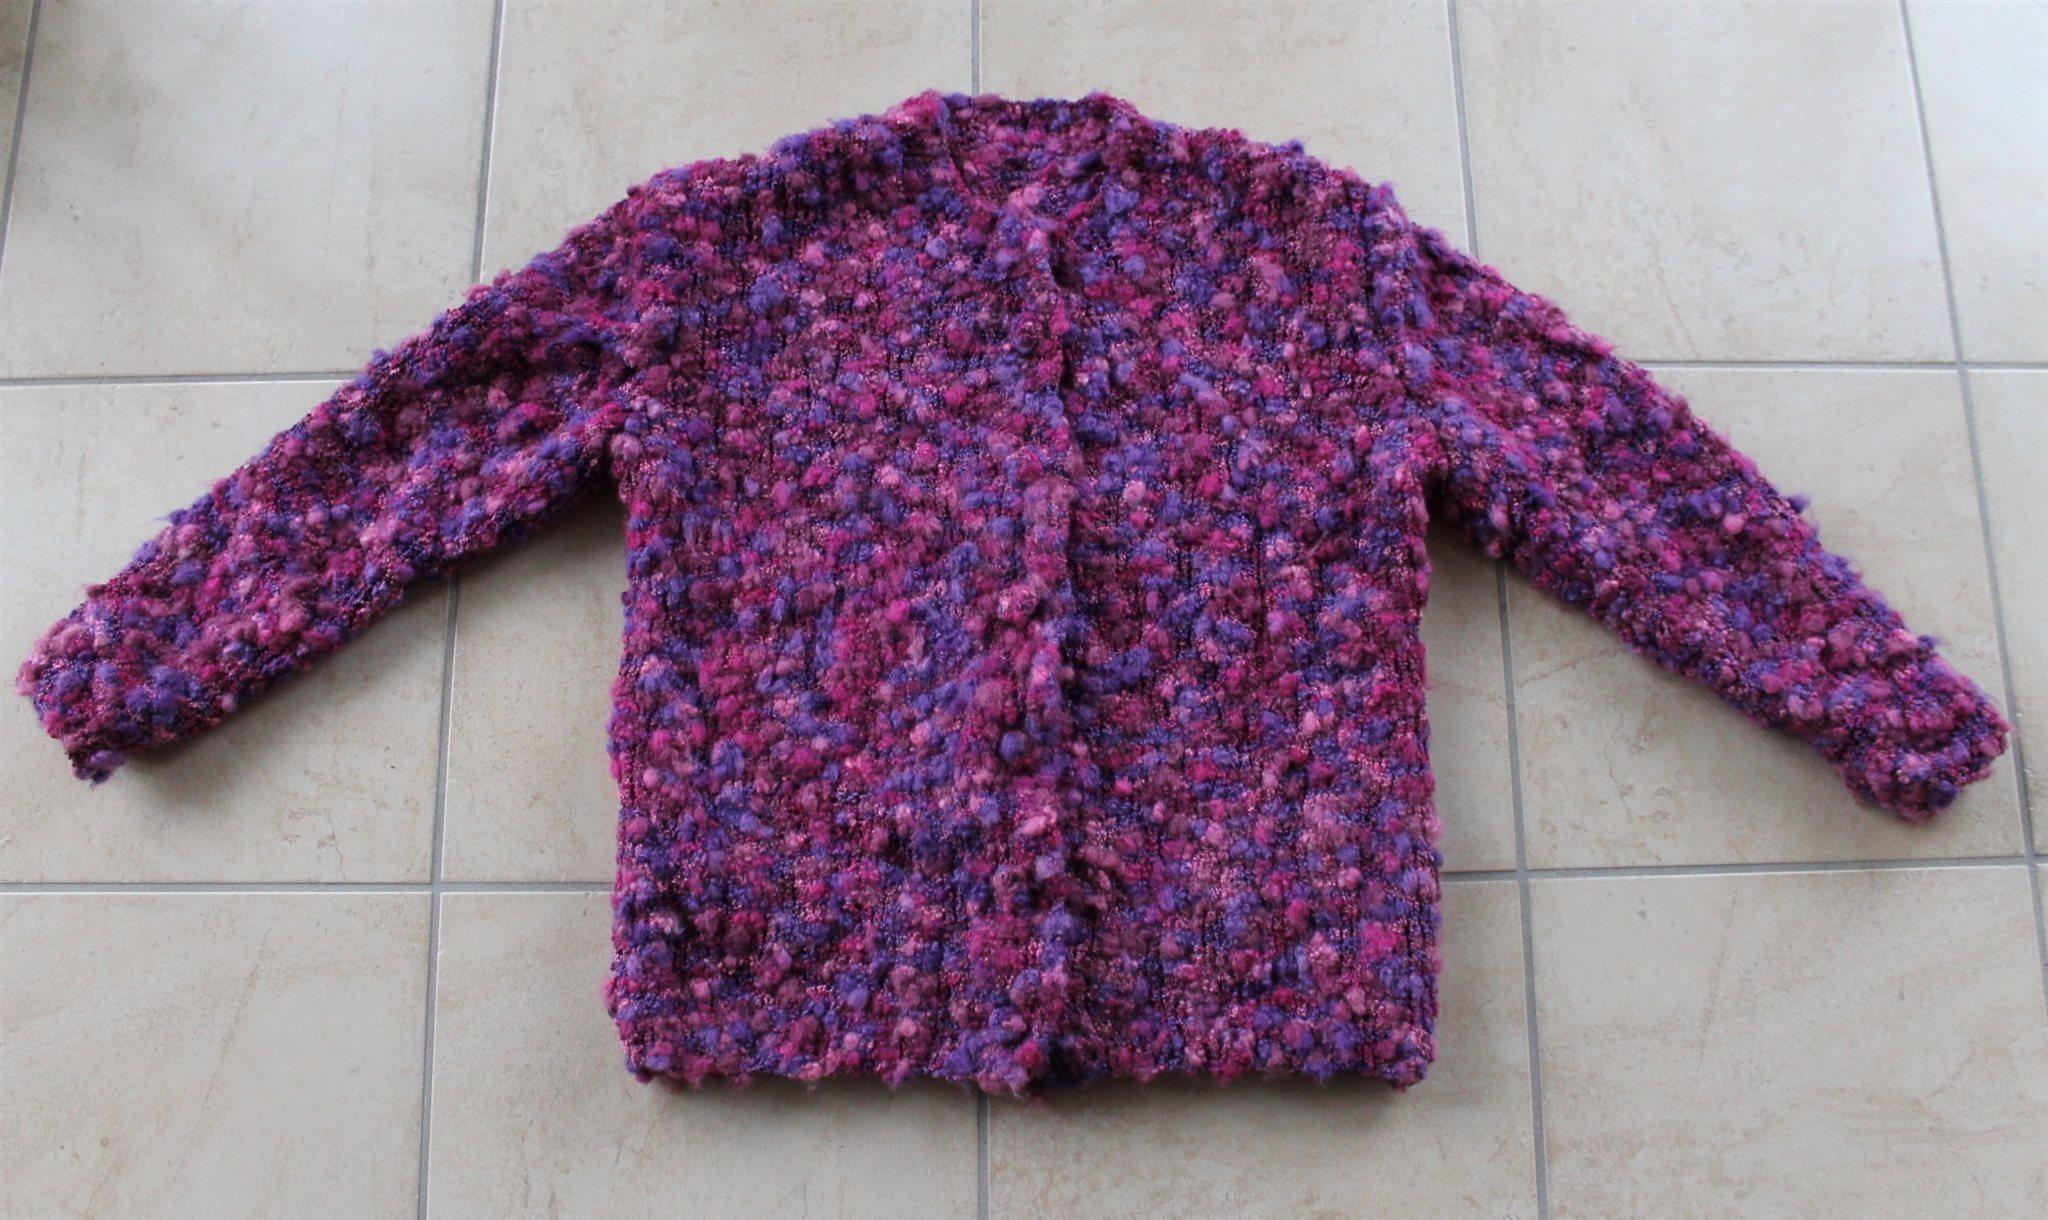 Vintage stickad tröja kofta jacka 90-tal lila g.. (335763452) ᐈ Köp ... e71362c519e45